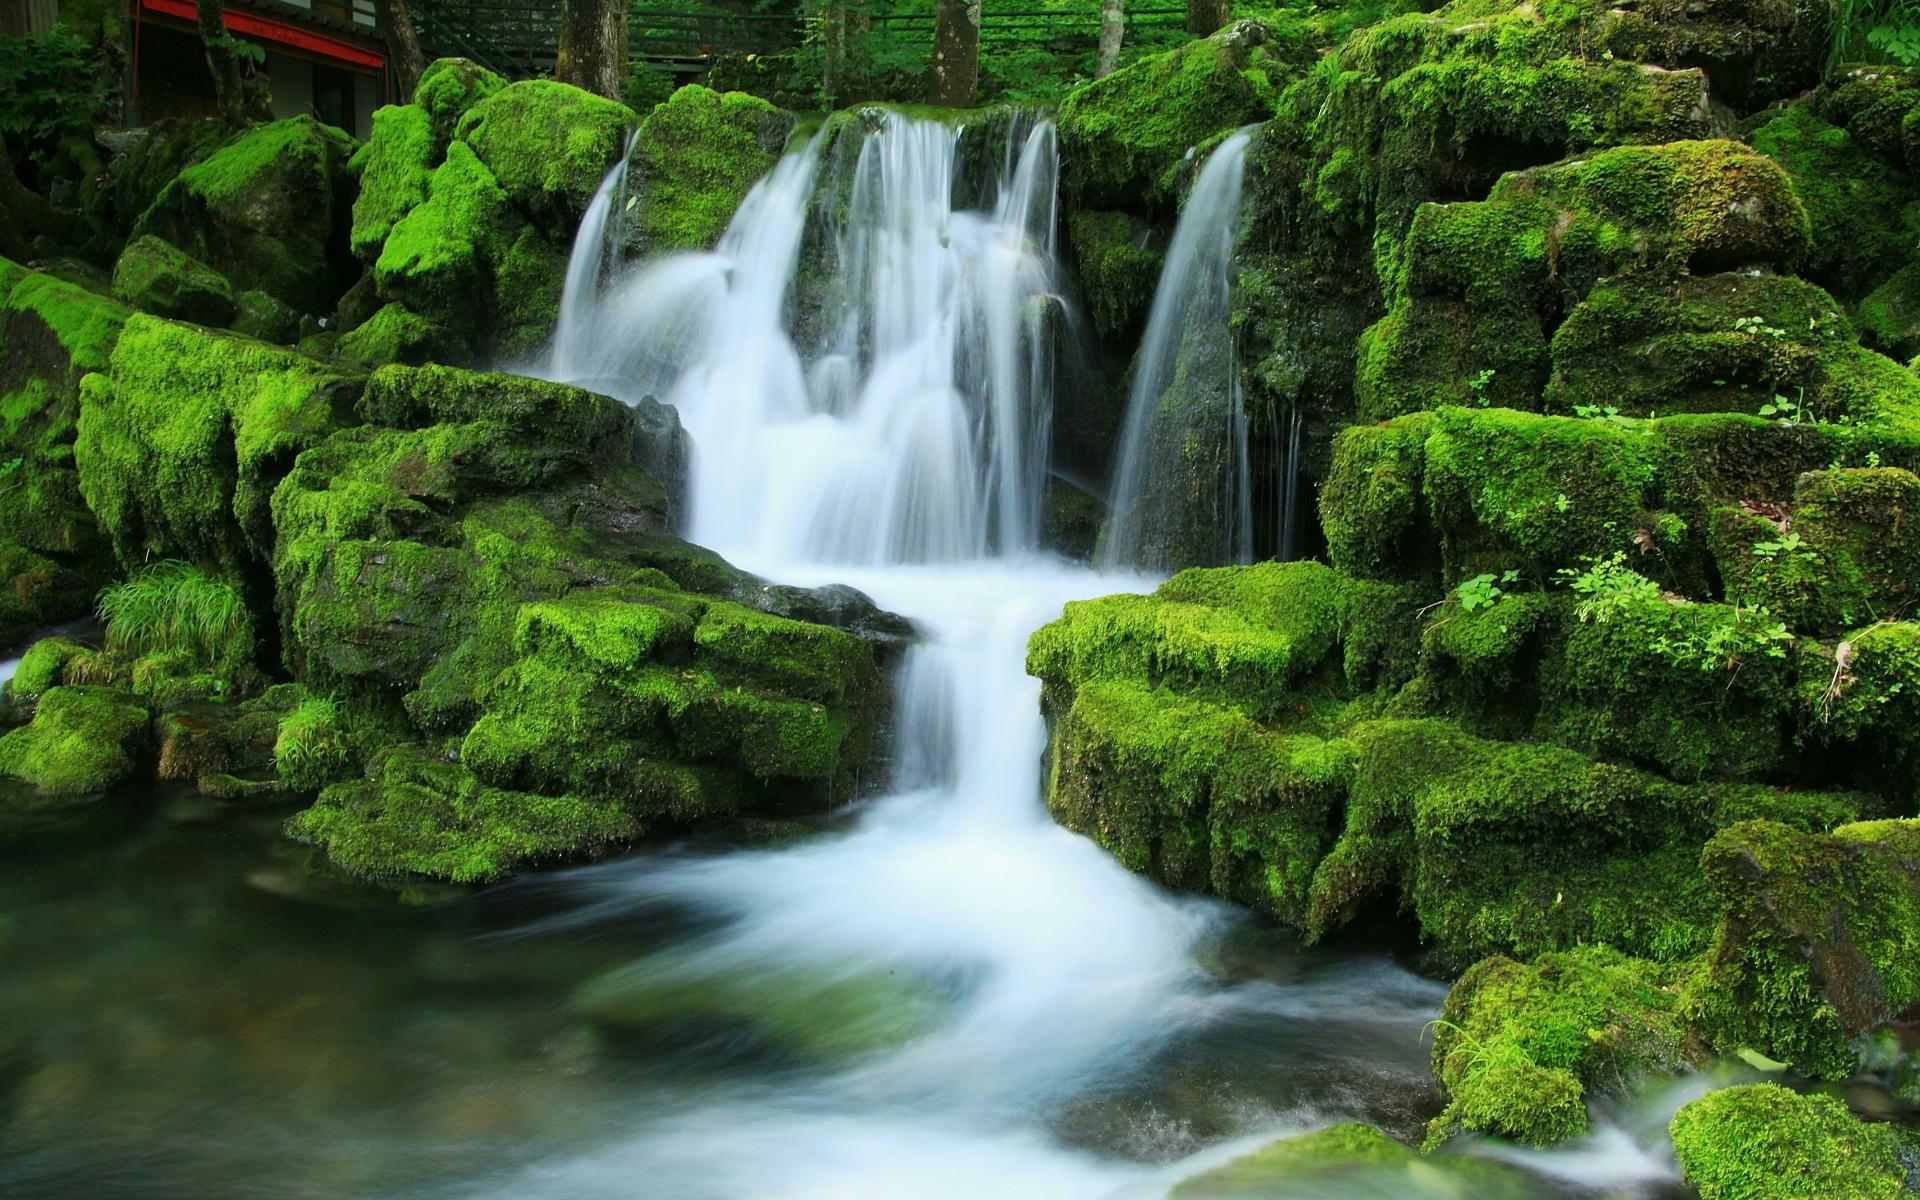 Waterfall Wallpaper · Waterfall Wallpaper · Waterfall Wallpaper · Waterfall Wallpaper ...